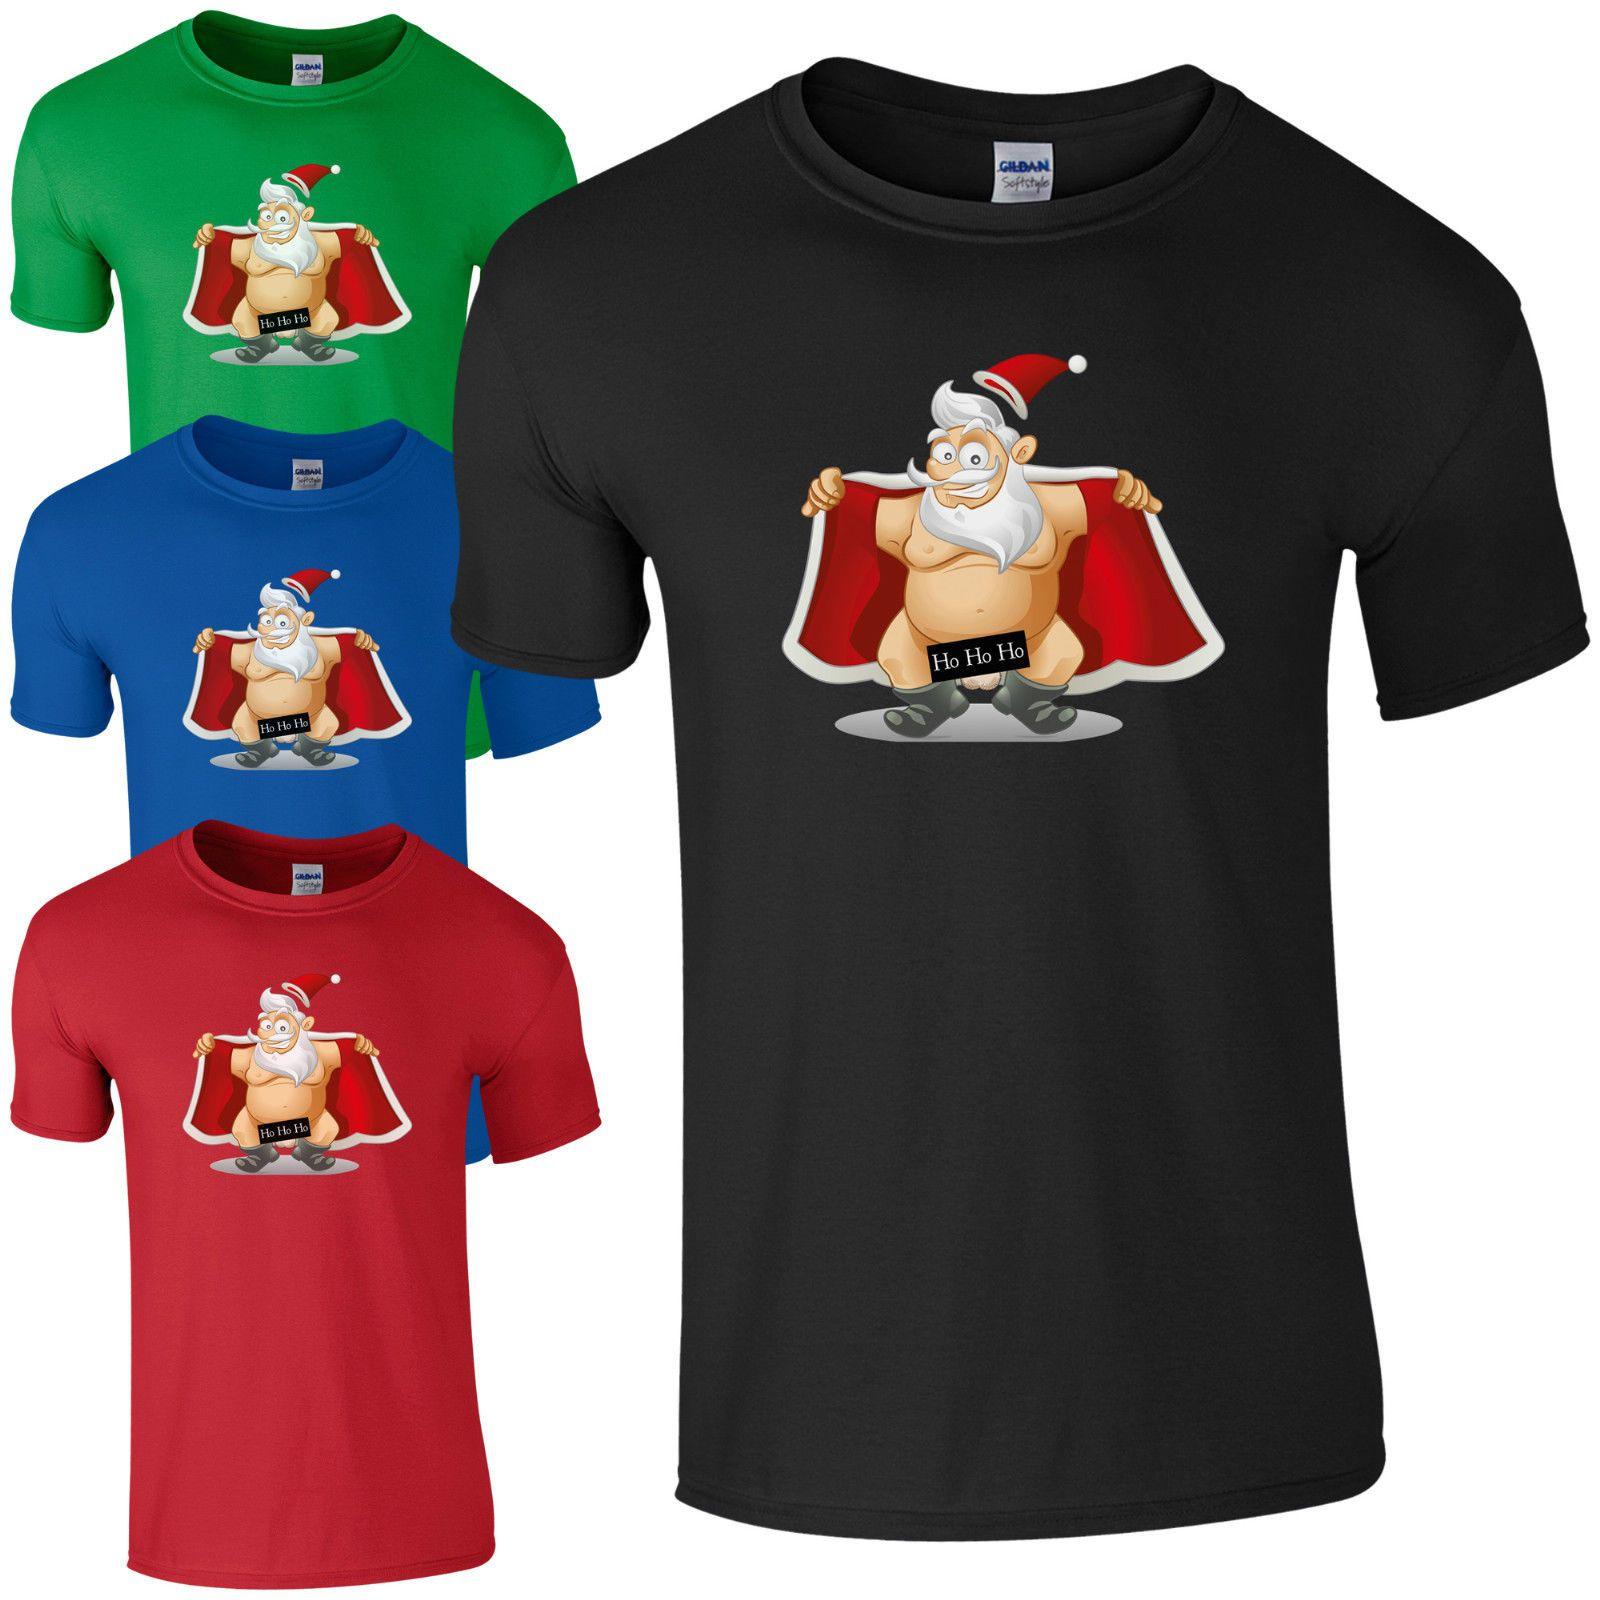 6fcc4859 Naughty Santa Flashing Ho Ho Ho T Shirt Funny Rude Christmas Gift Joke Men  Top Cartoon T Shirt Men Fun Tee Shirts Silly T Shirts From Cls6688523, ...